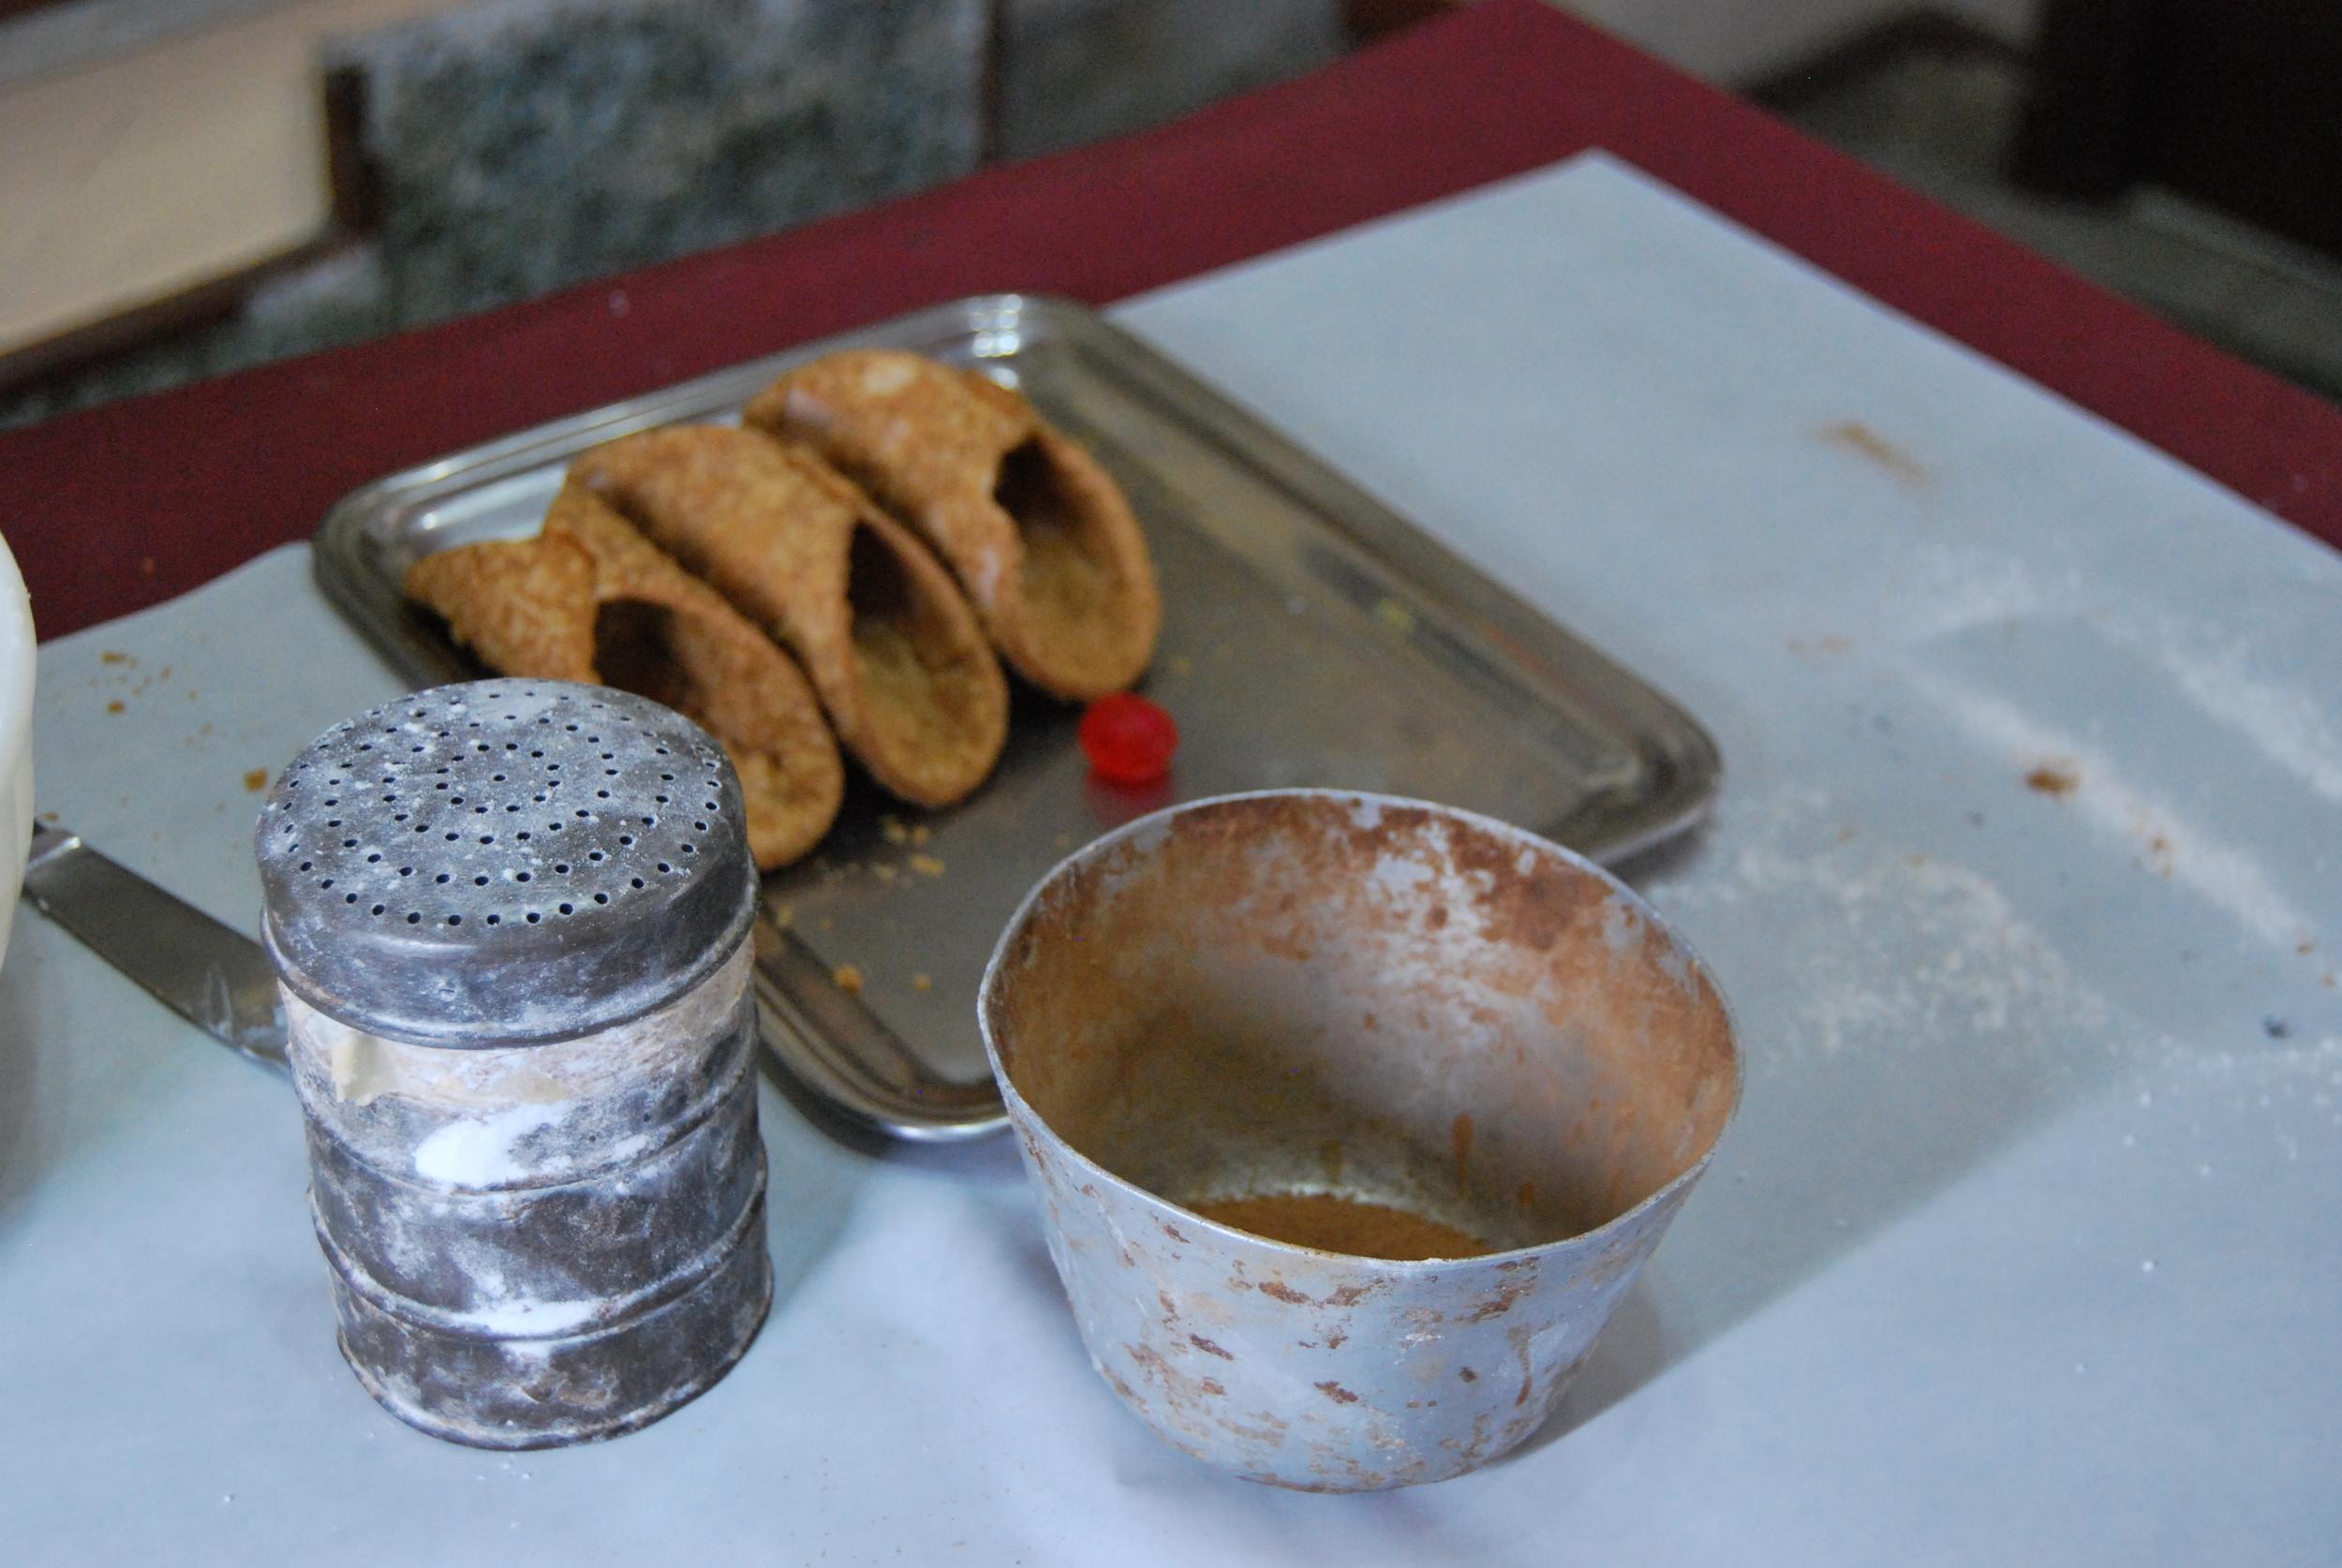 Preparations of the Sicilian desserts